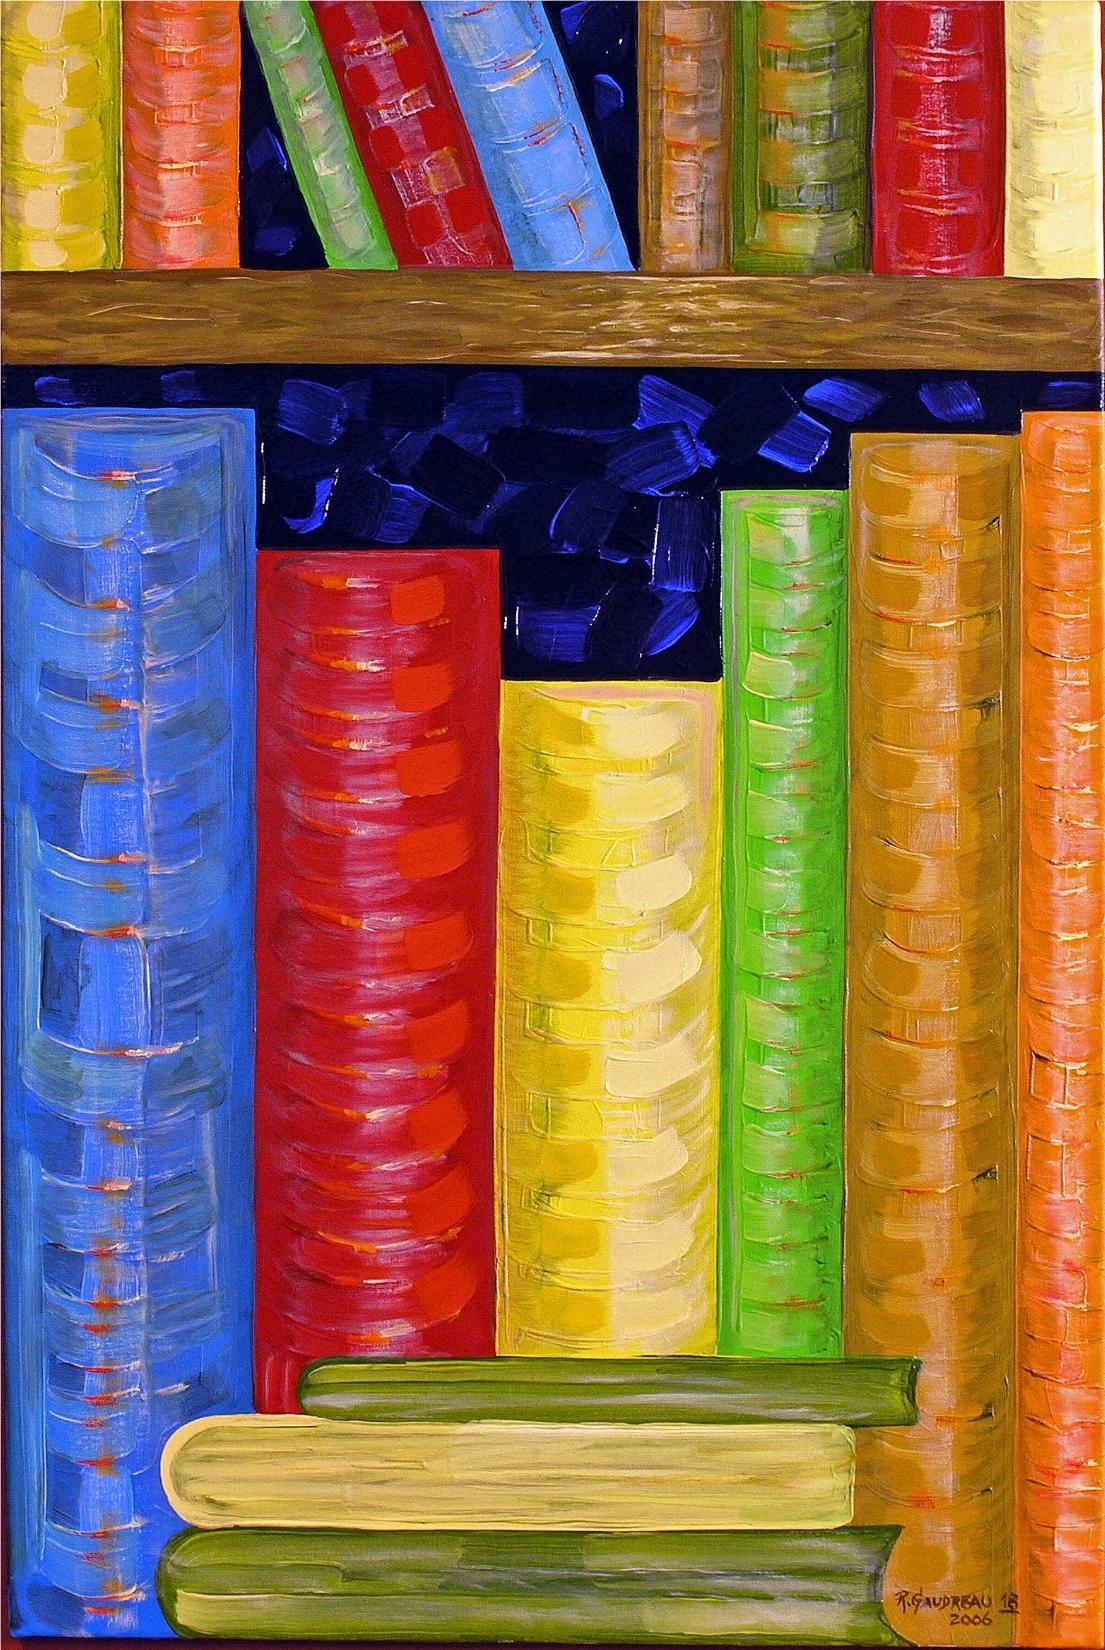 1250 18 Books Max pxl MasterJPG.jpg